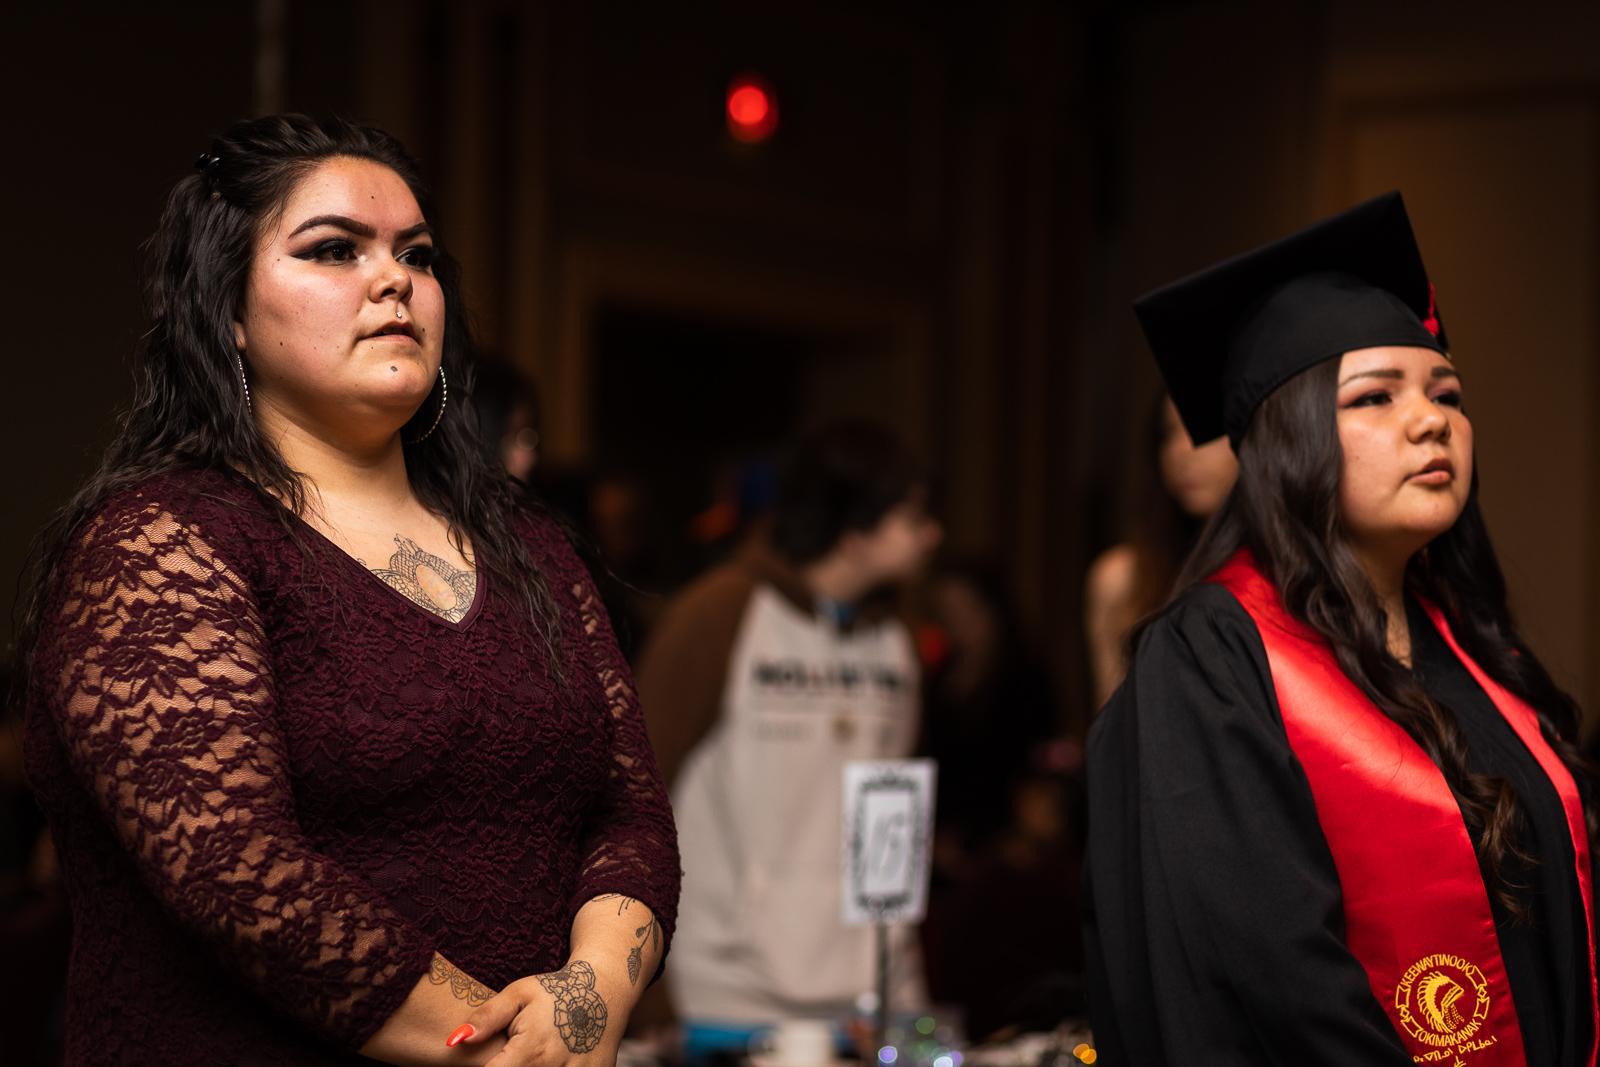 kihs-graduation-2019-fb-17.jpg